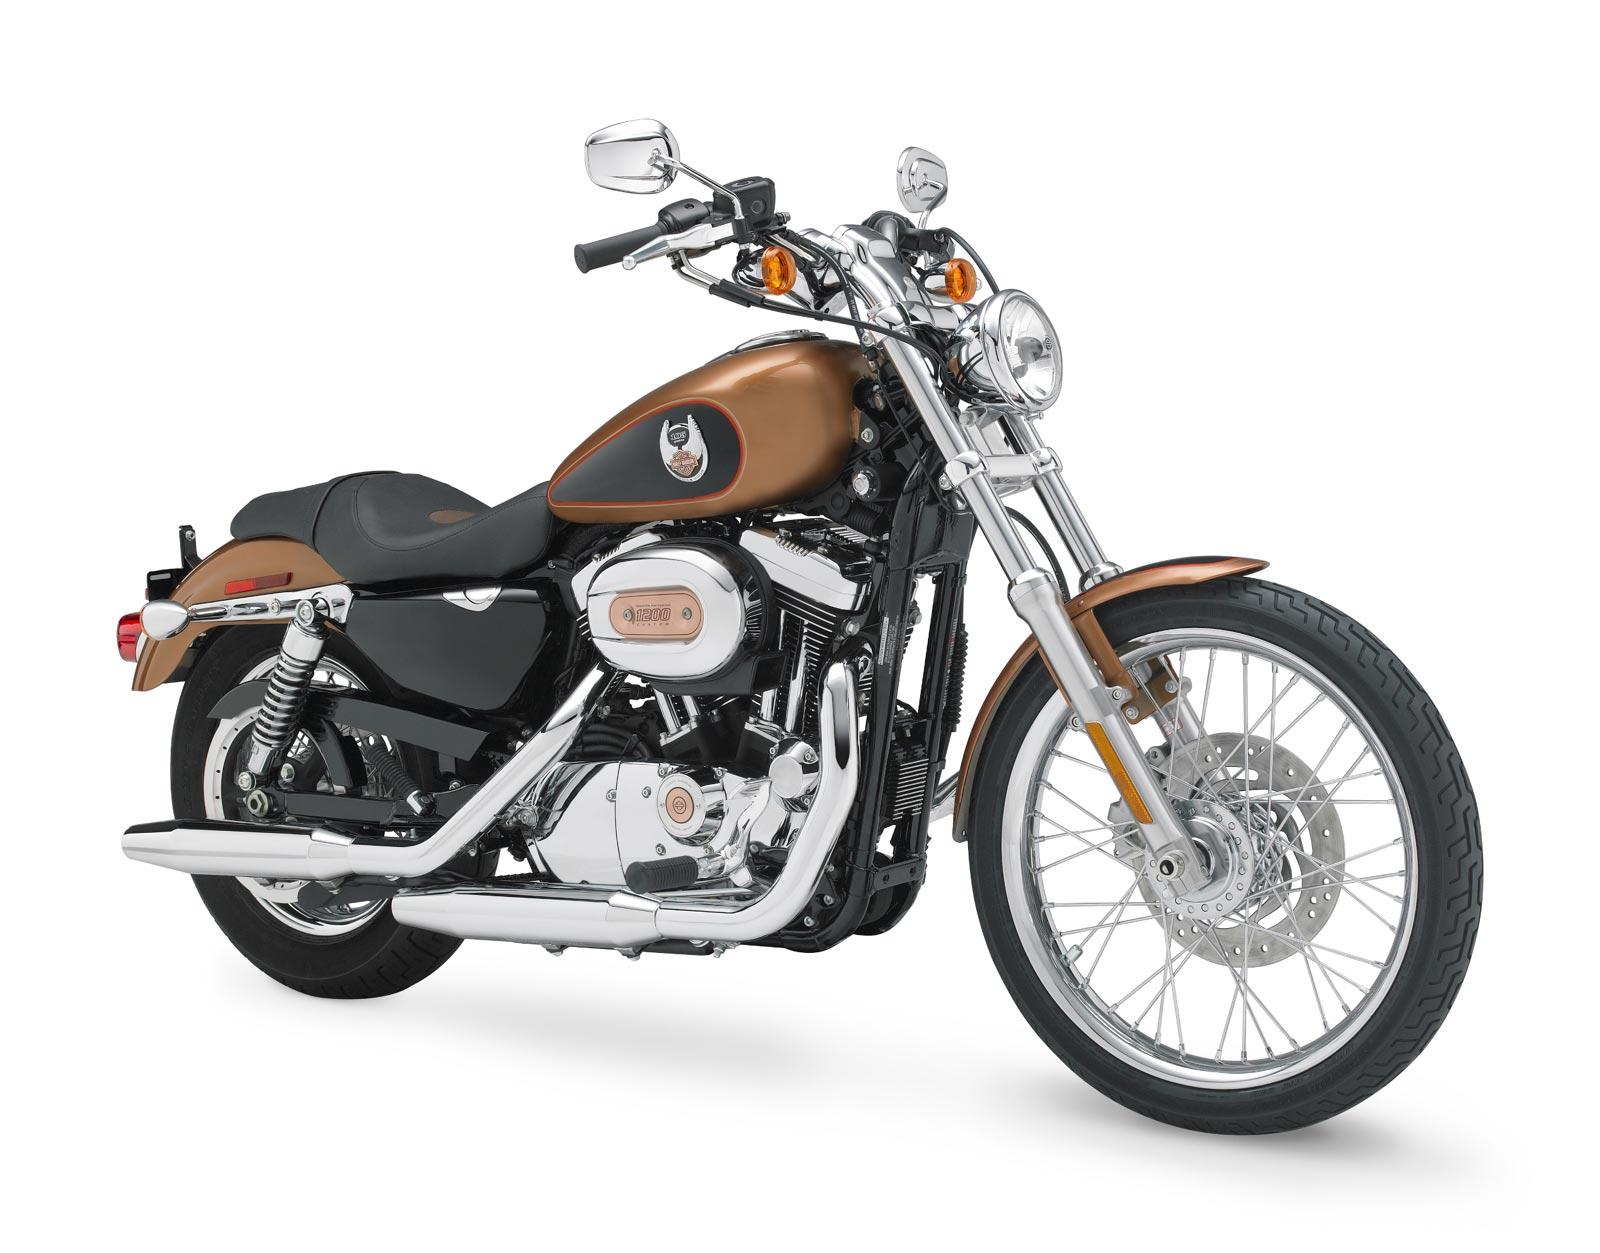 Harley Davidson 1200 Custom 105th Anniversary Edition